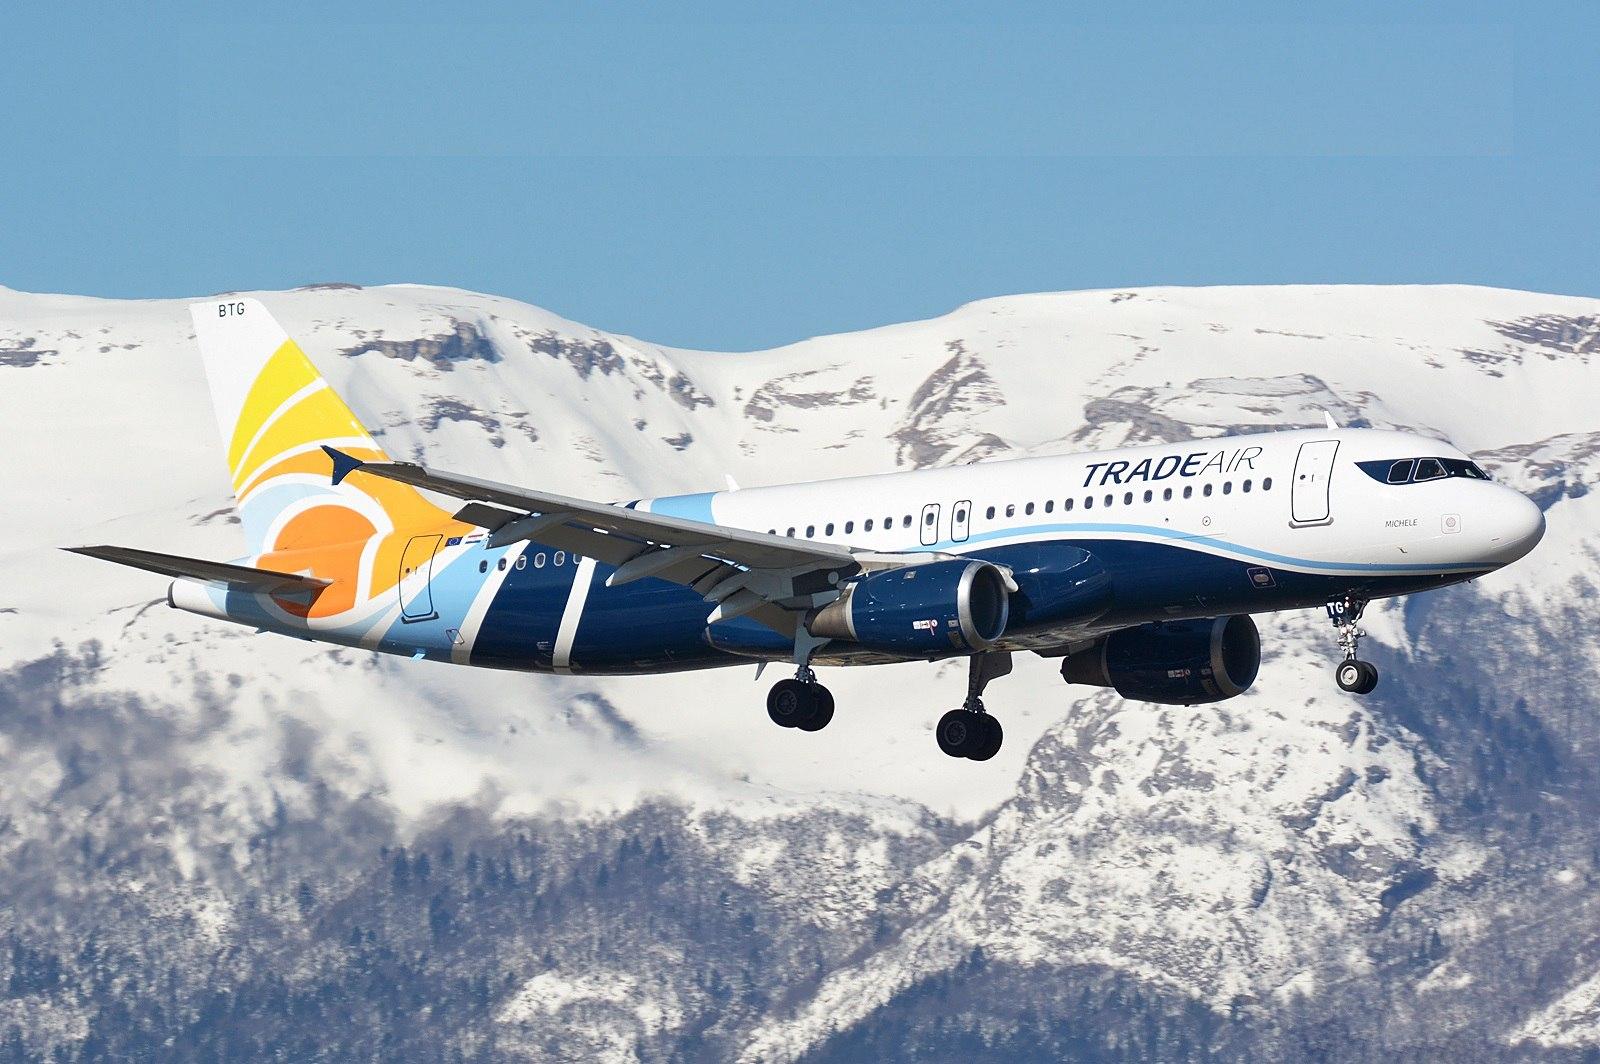 Airbus A320 в ливрее хорватской Trade Air